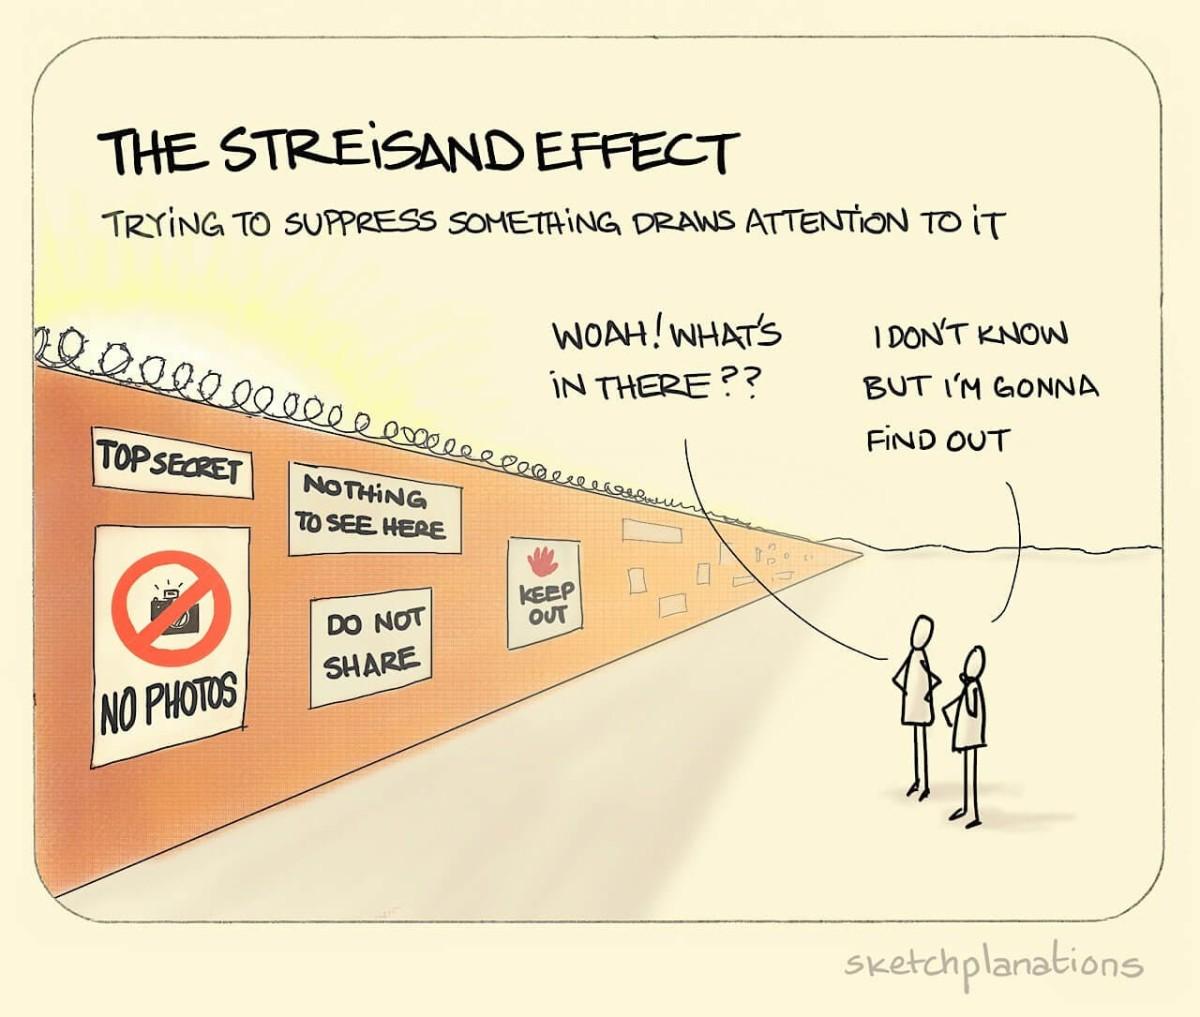 https://sketchplanations.com/the-streisand-effect